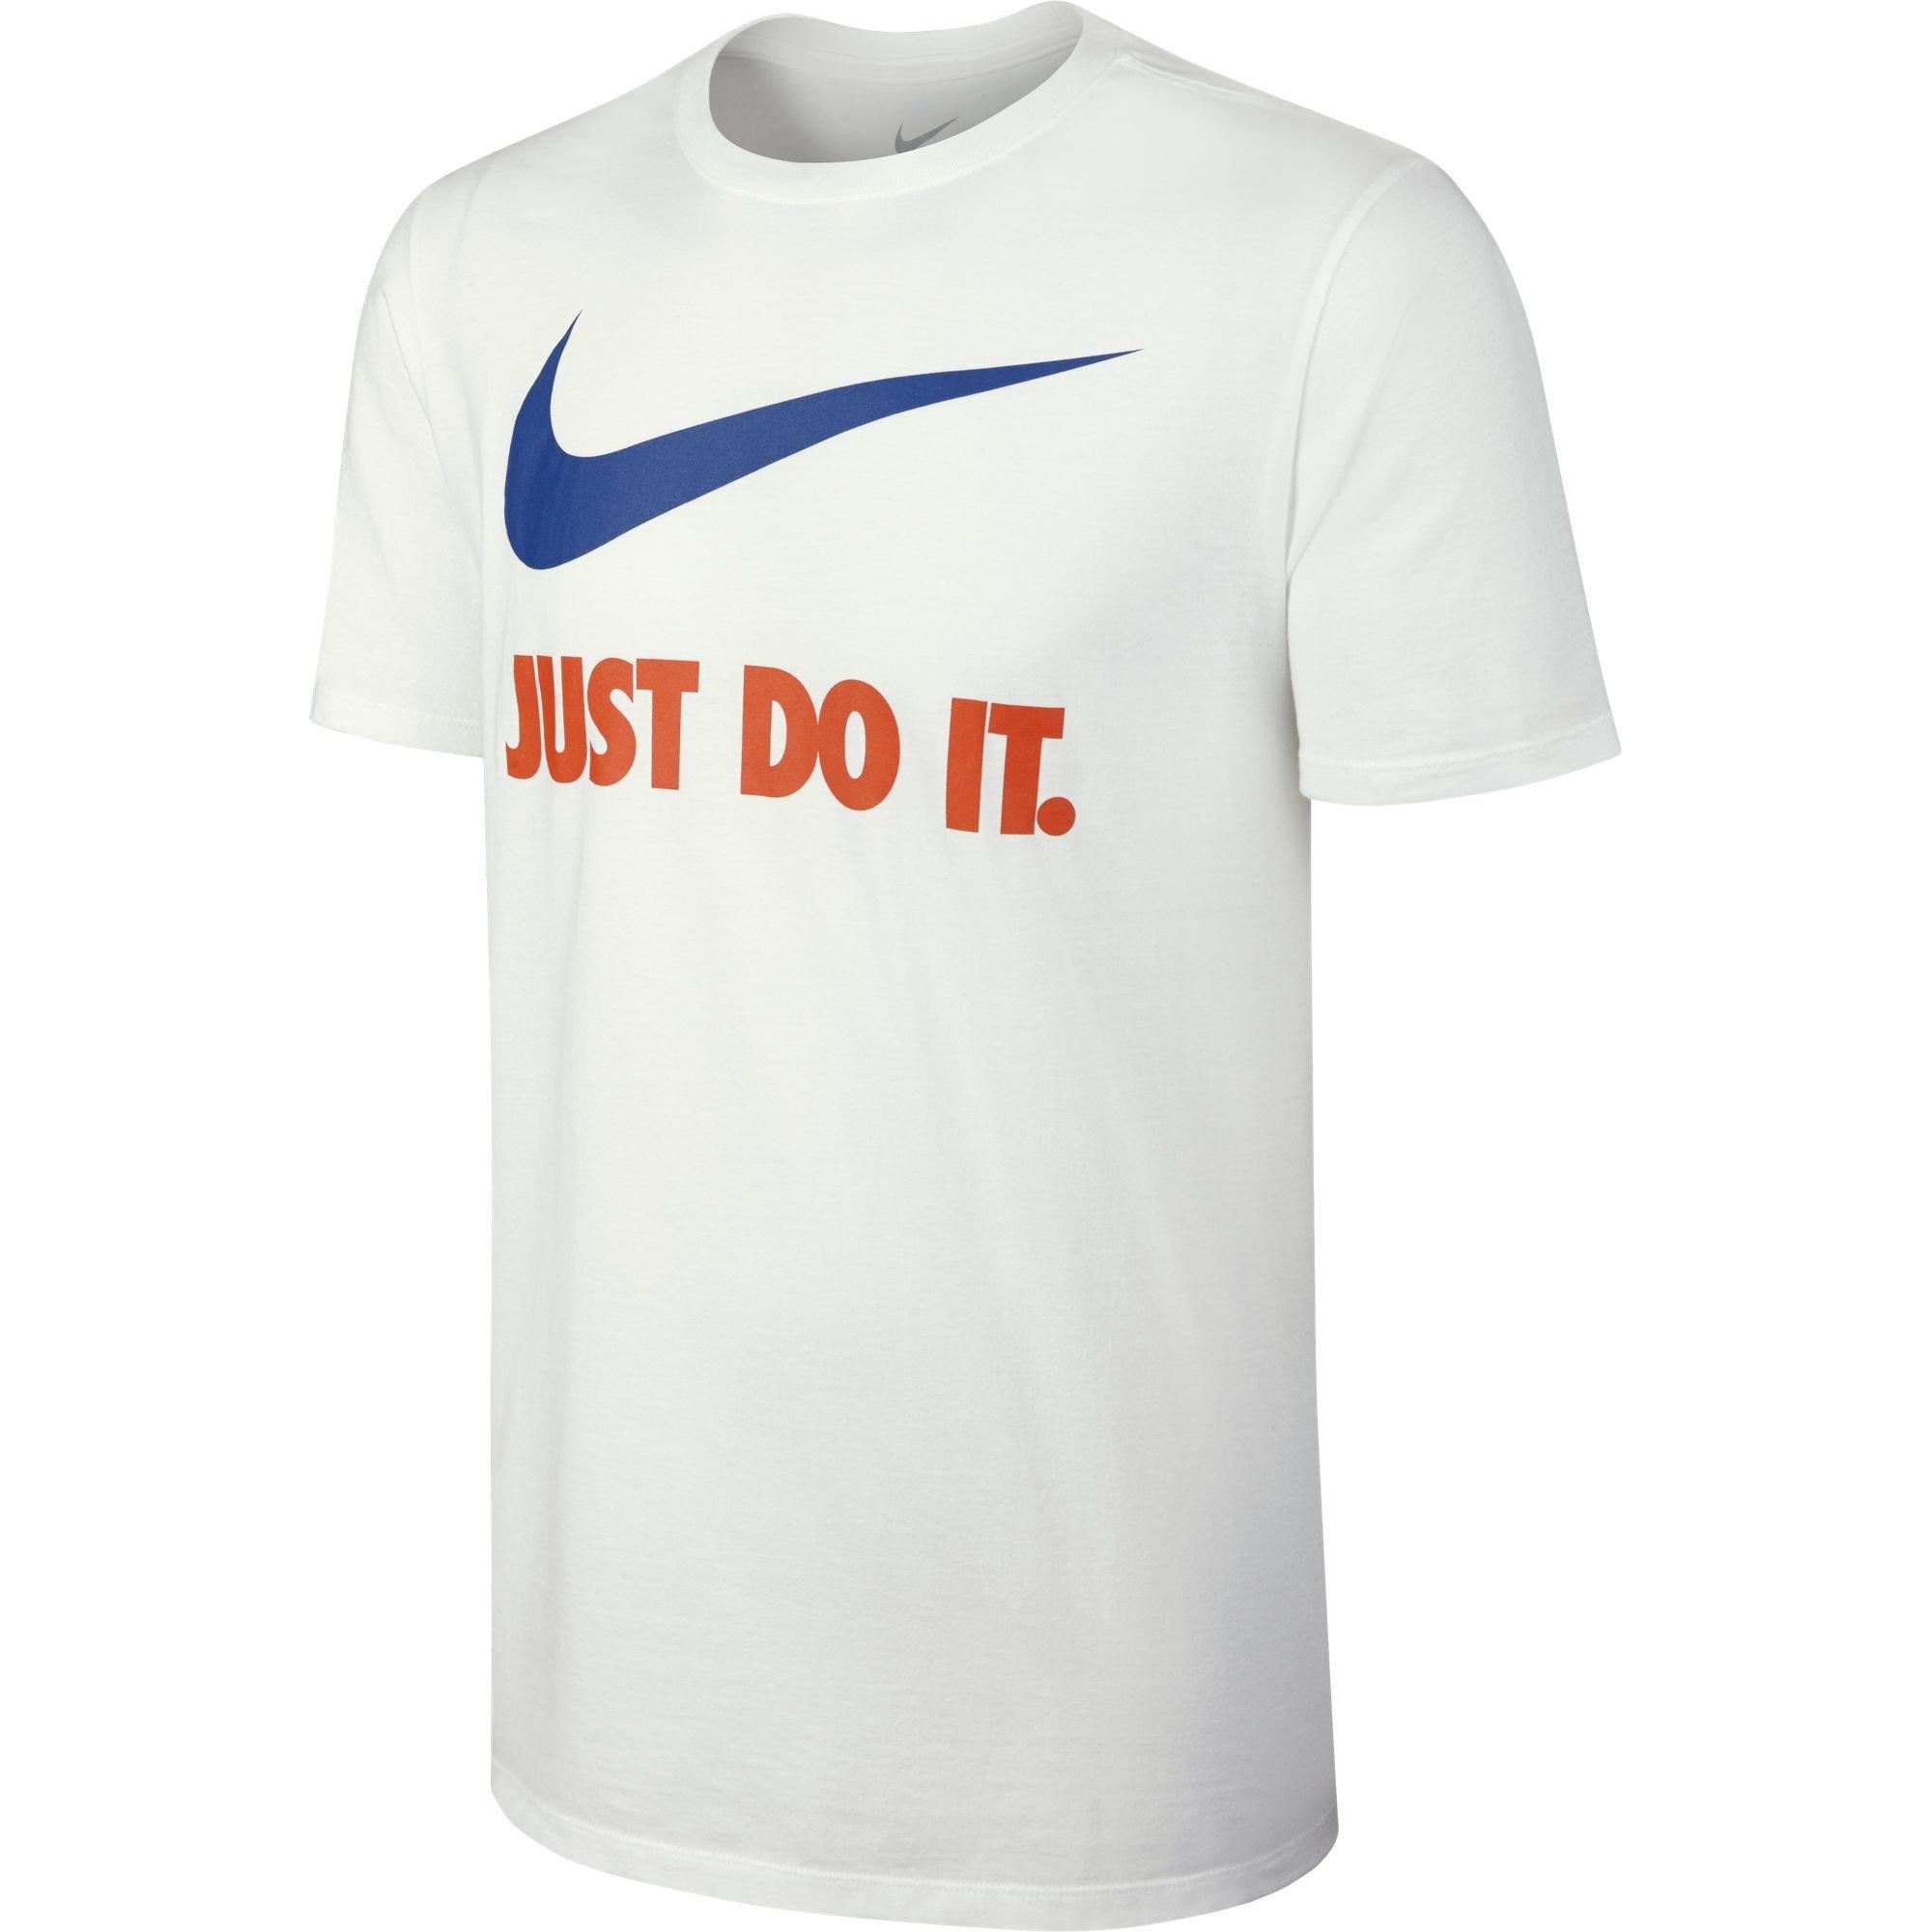 NIKE Sportswear Men's Just Do It Swoosh Tee, White/Team Orange/Team Royal, Small